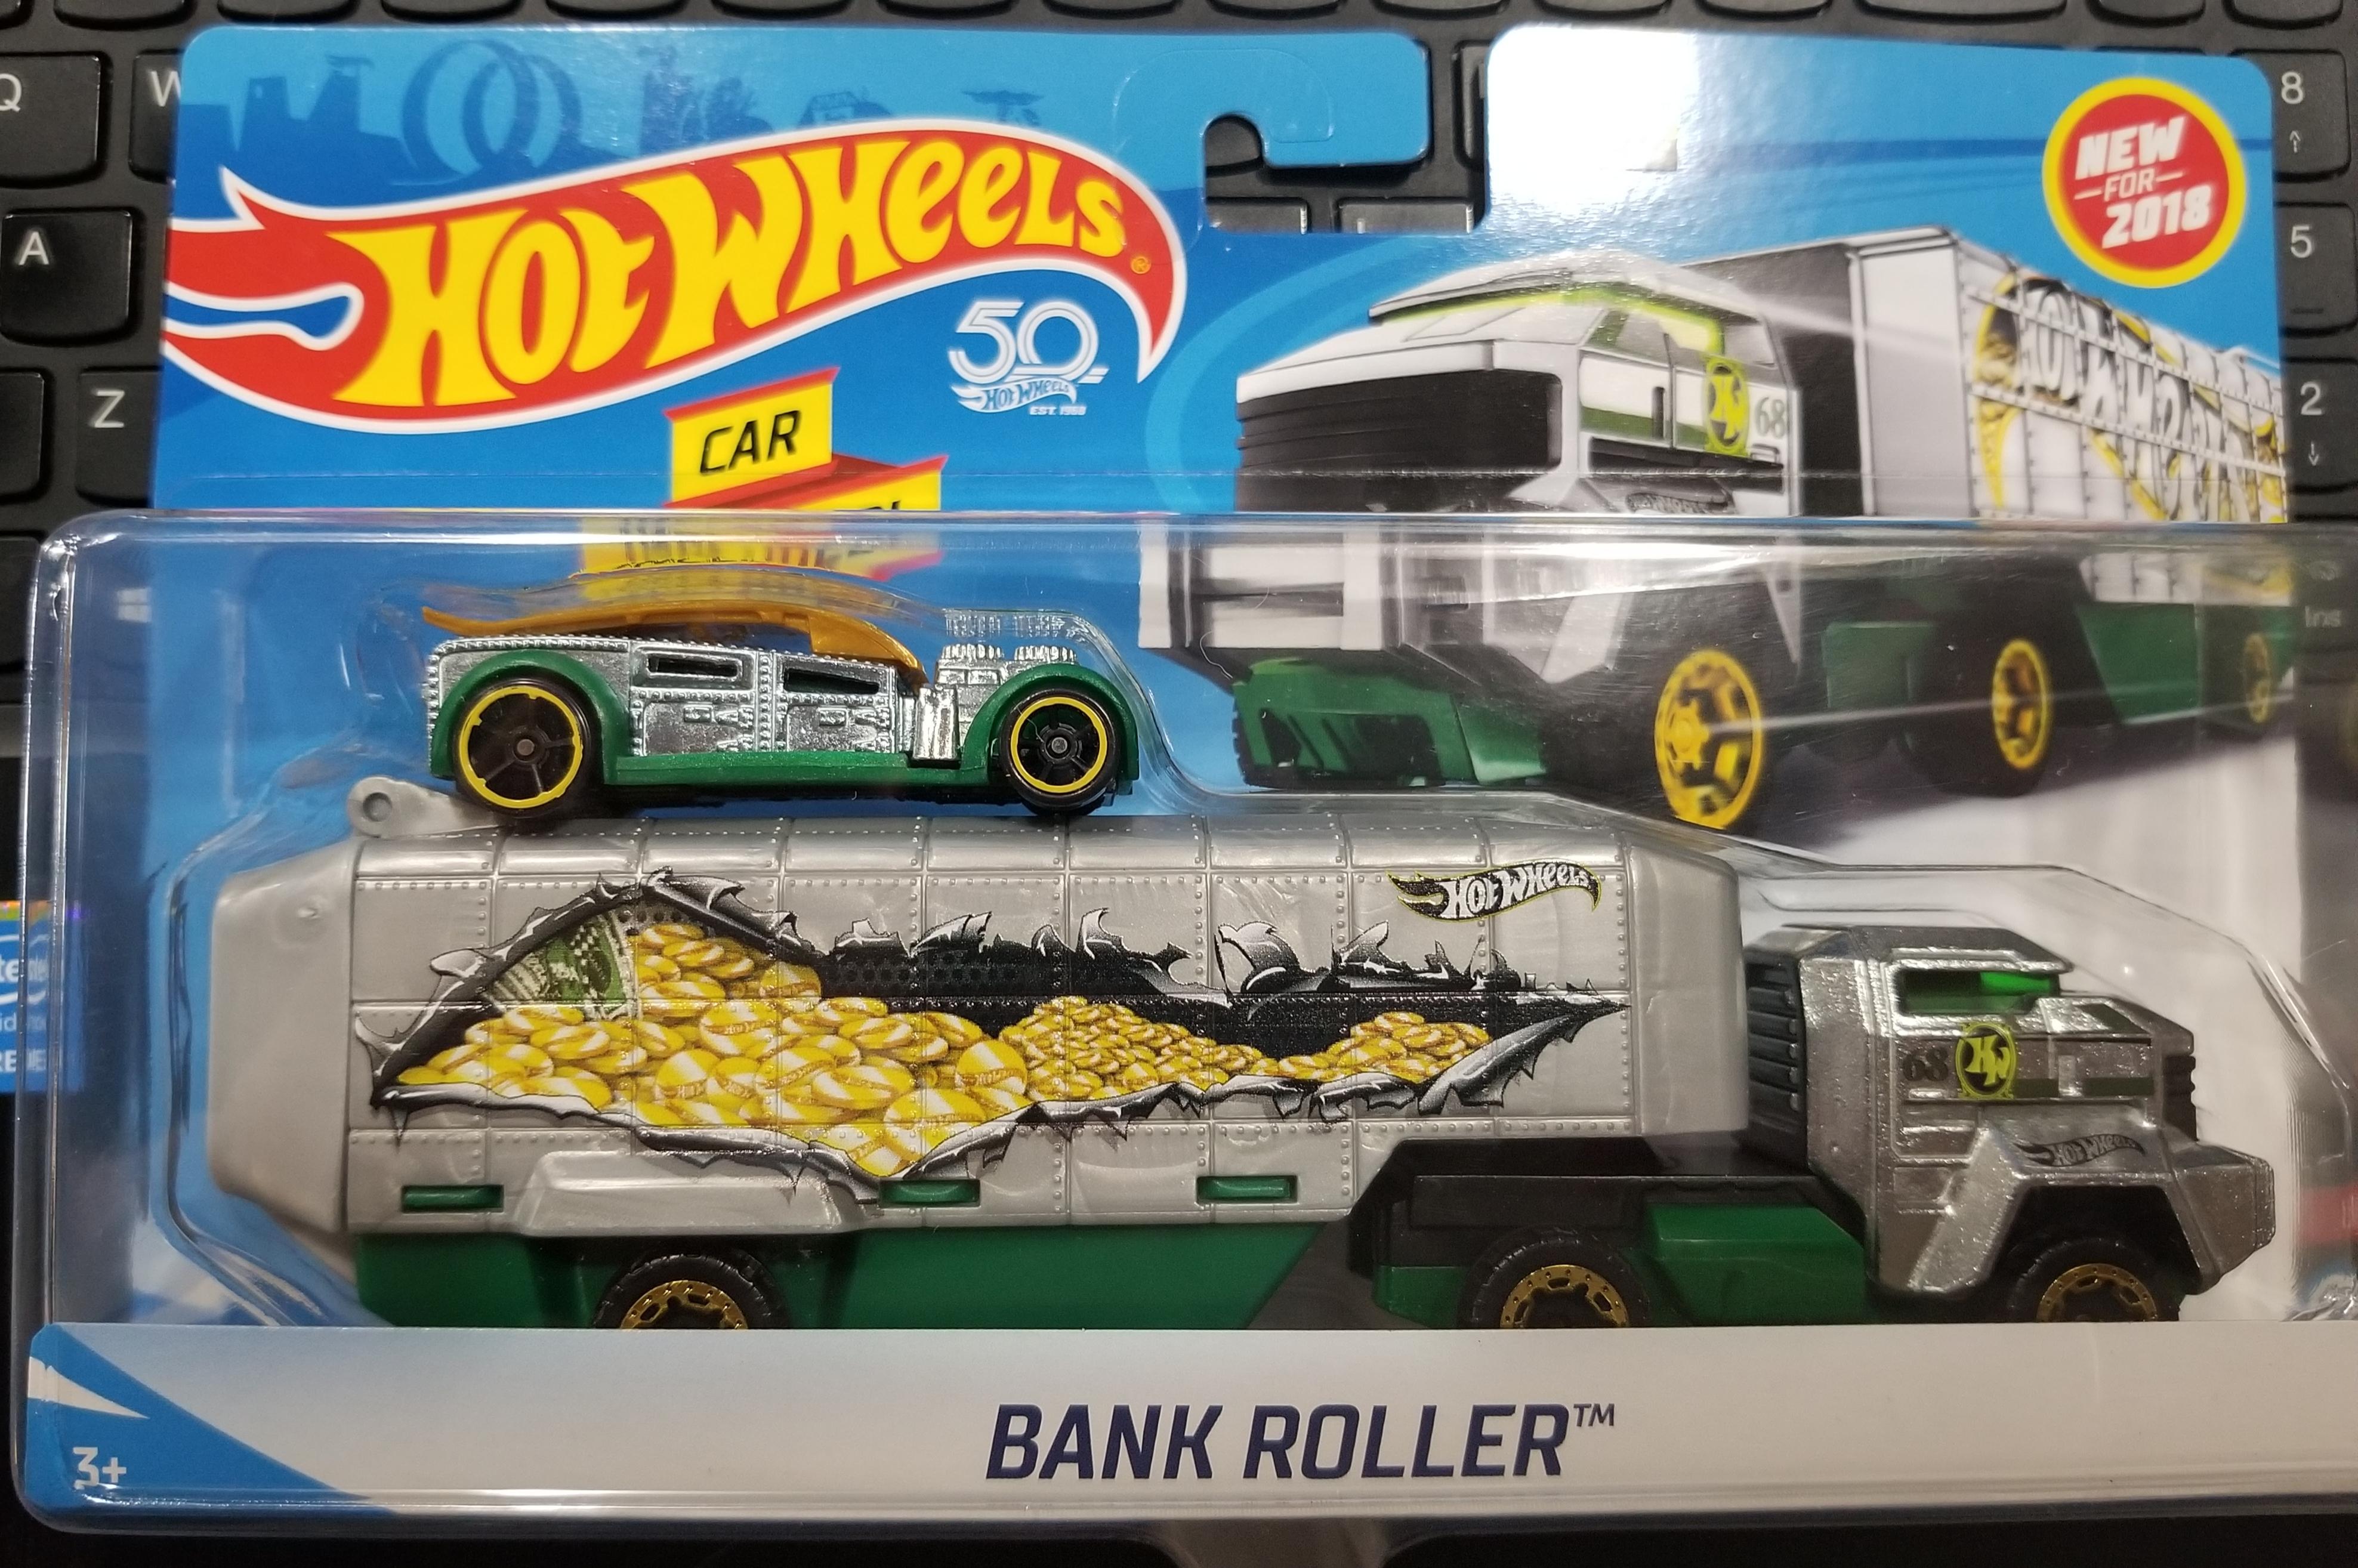 Bank Roller